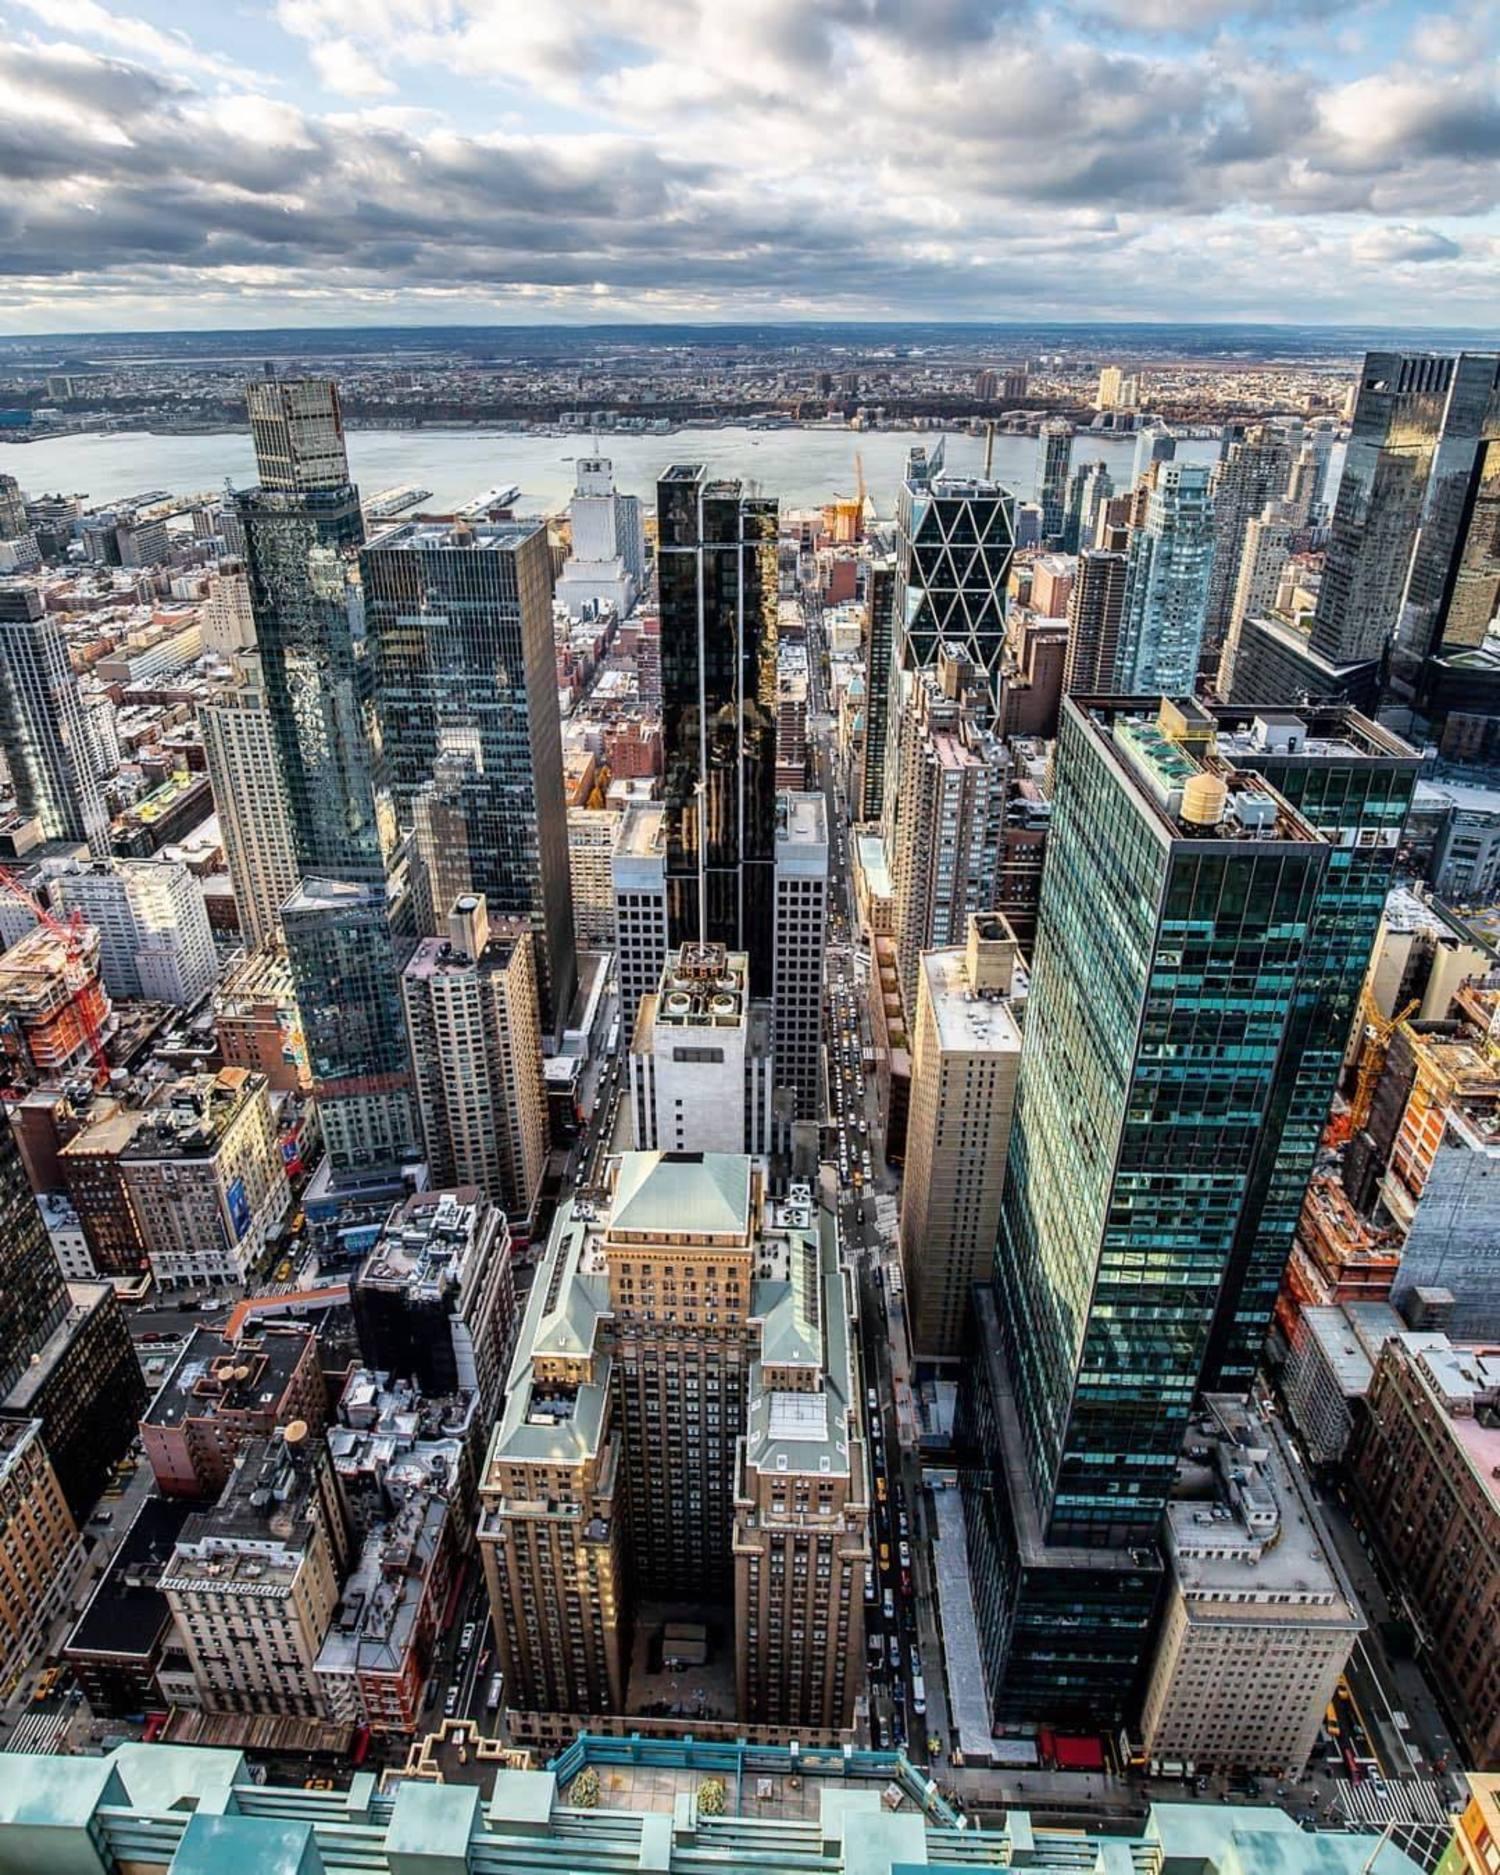 Hell's Kitchen, New York, New York. Photo via @lightsensitivity #viewingnyc #nyc #newyork #newyorkcity